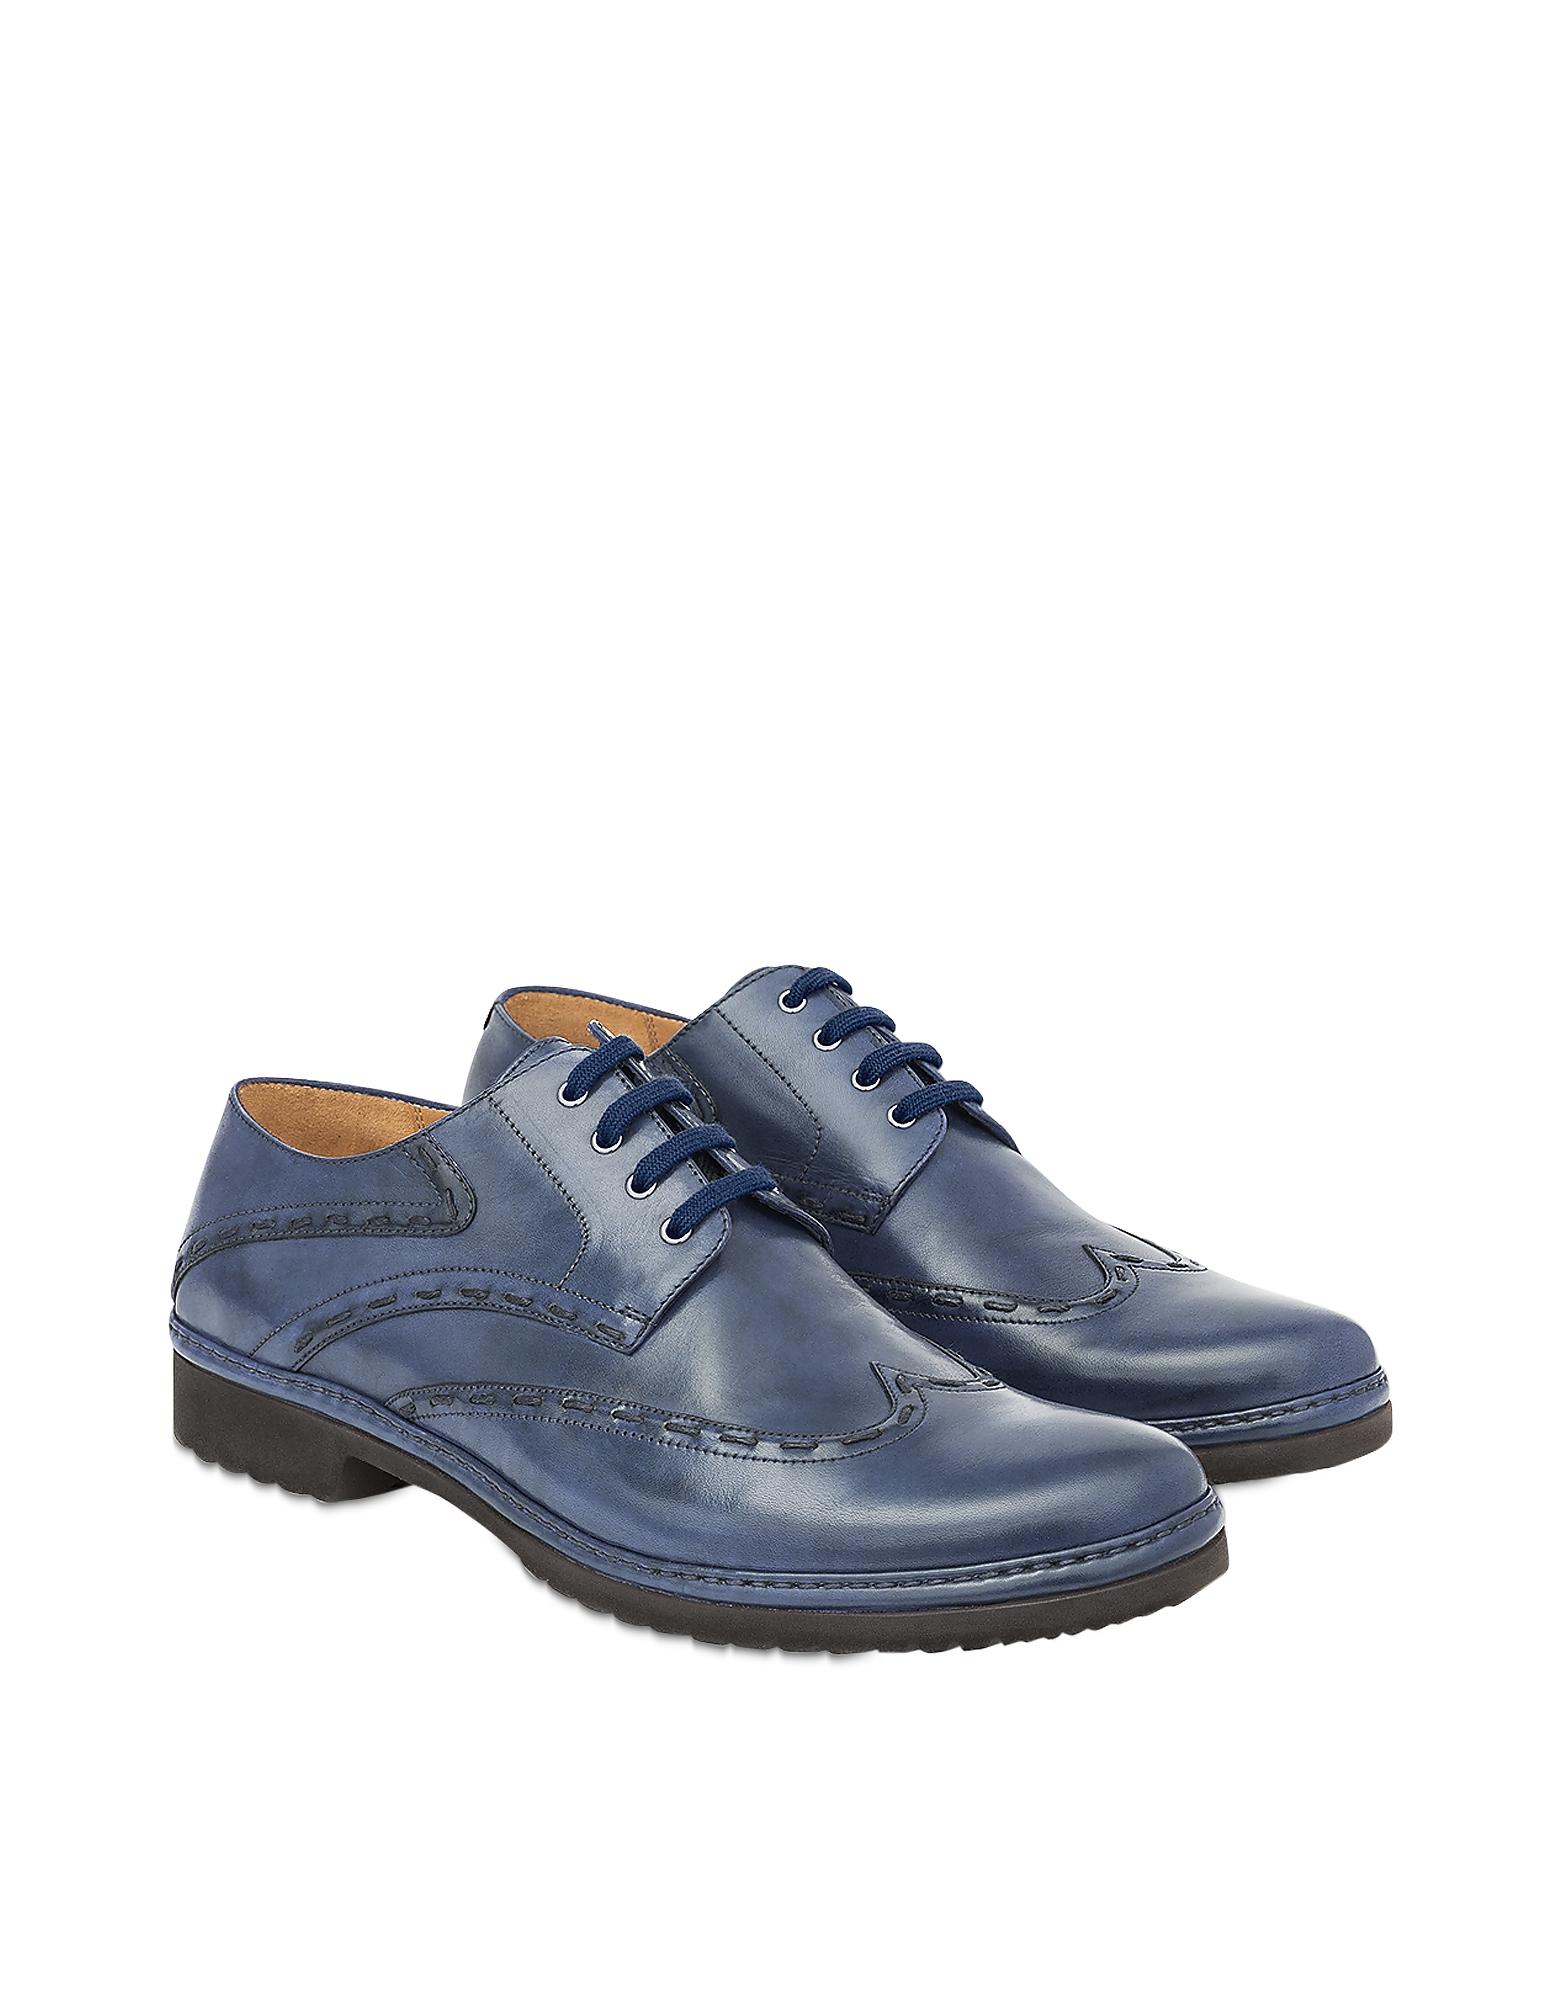 Pakerson 帕克森 鞋履, Blue手工皮革系带休闲鞋